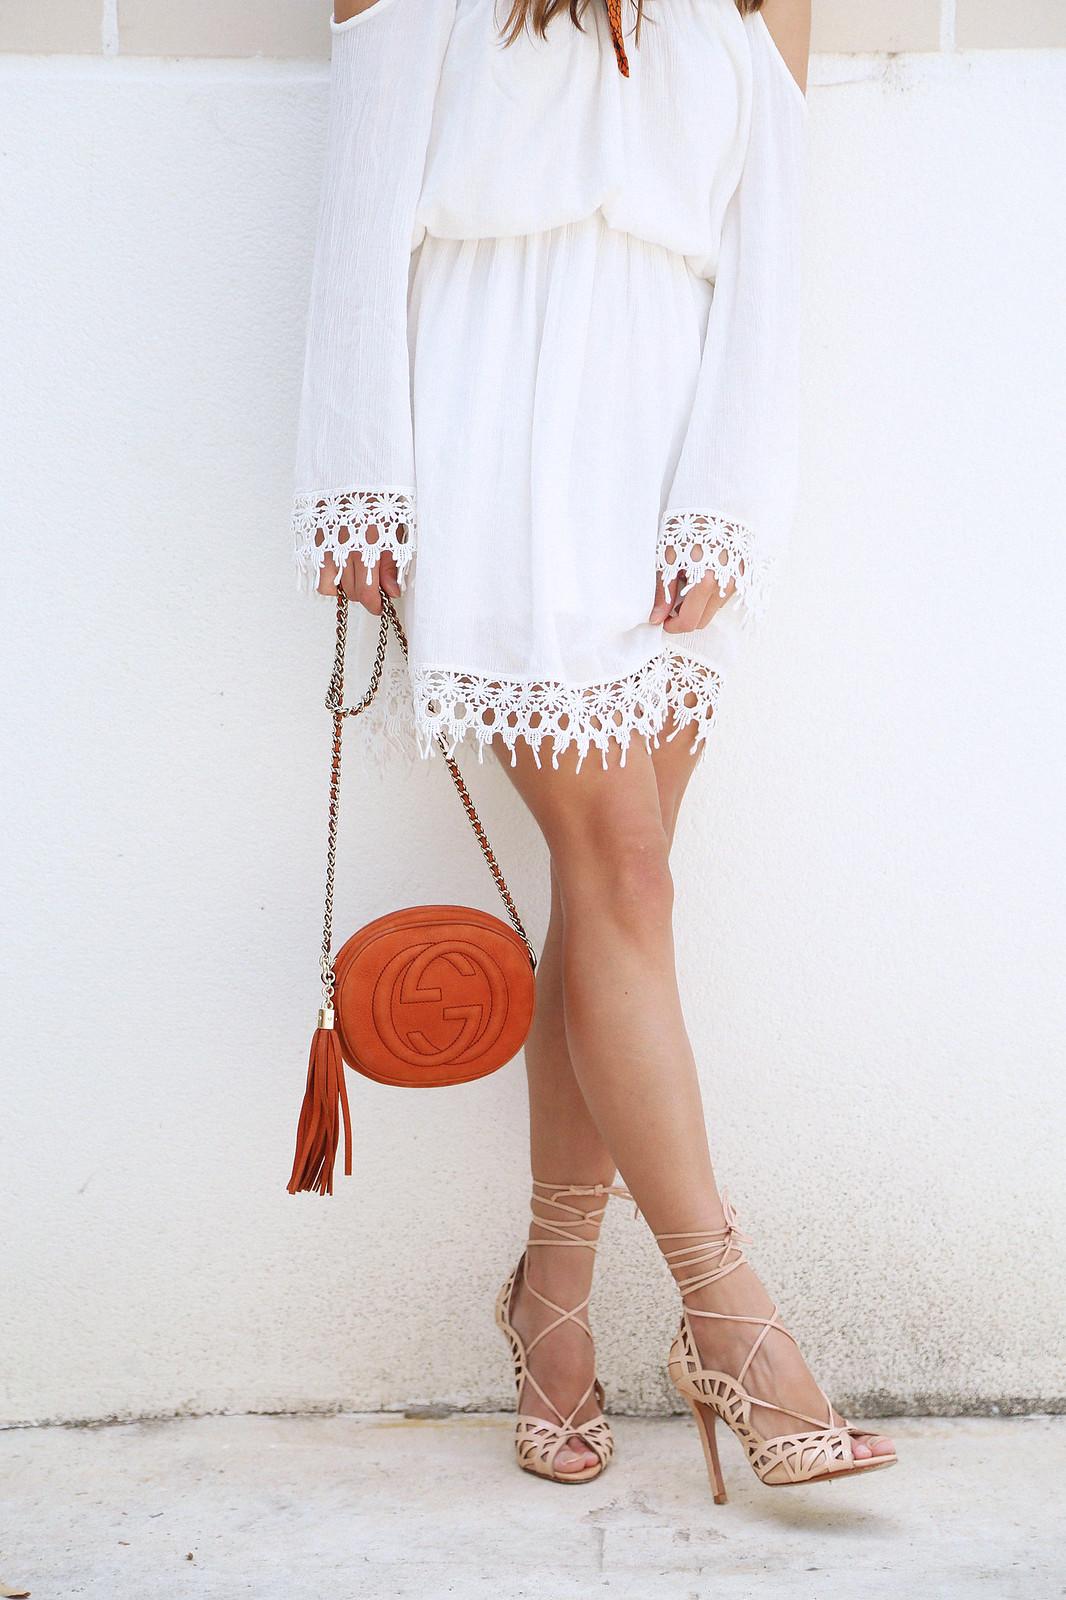 jessie chanes seams for a desire white off shoulders dress schutz sandals-9